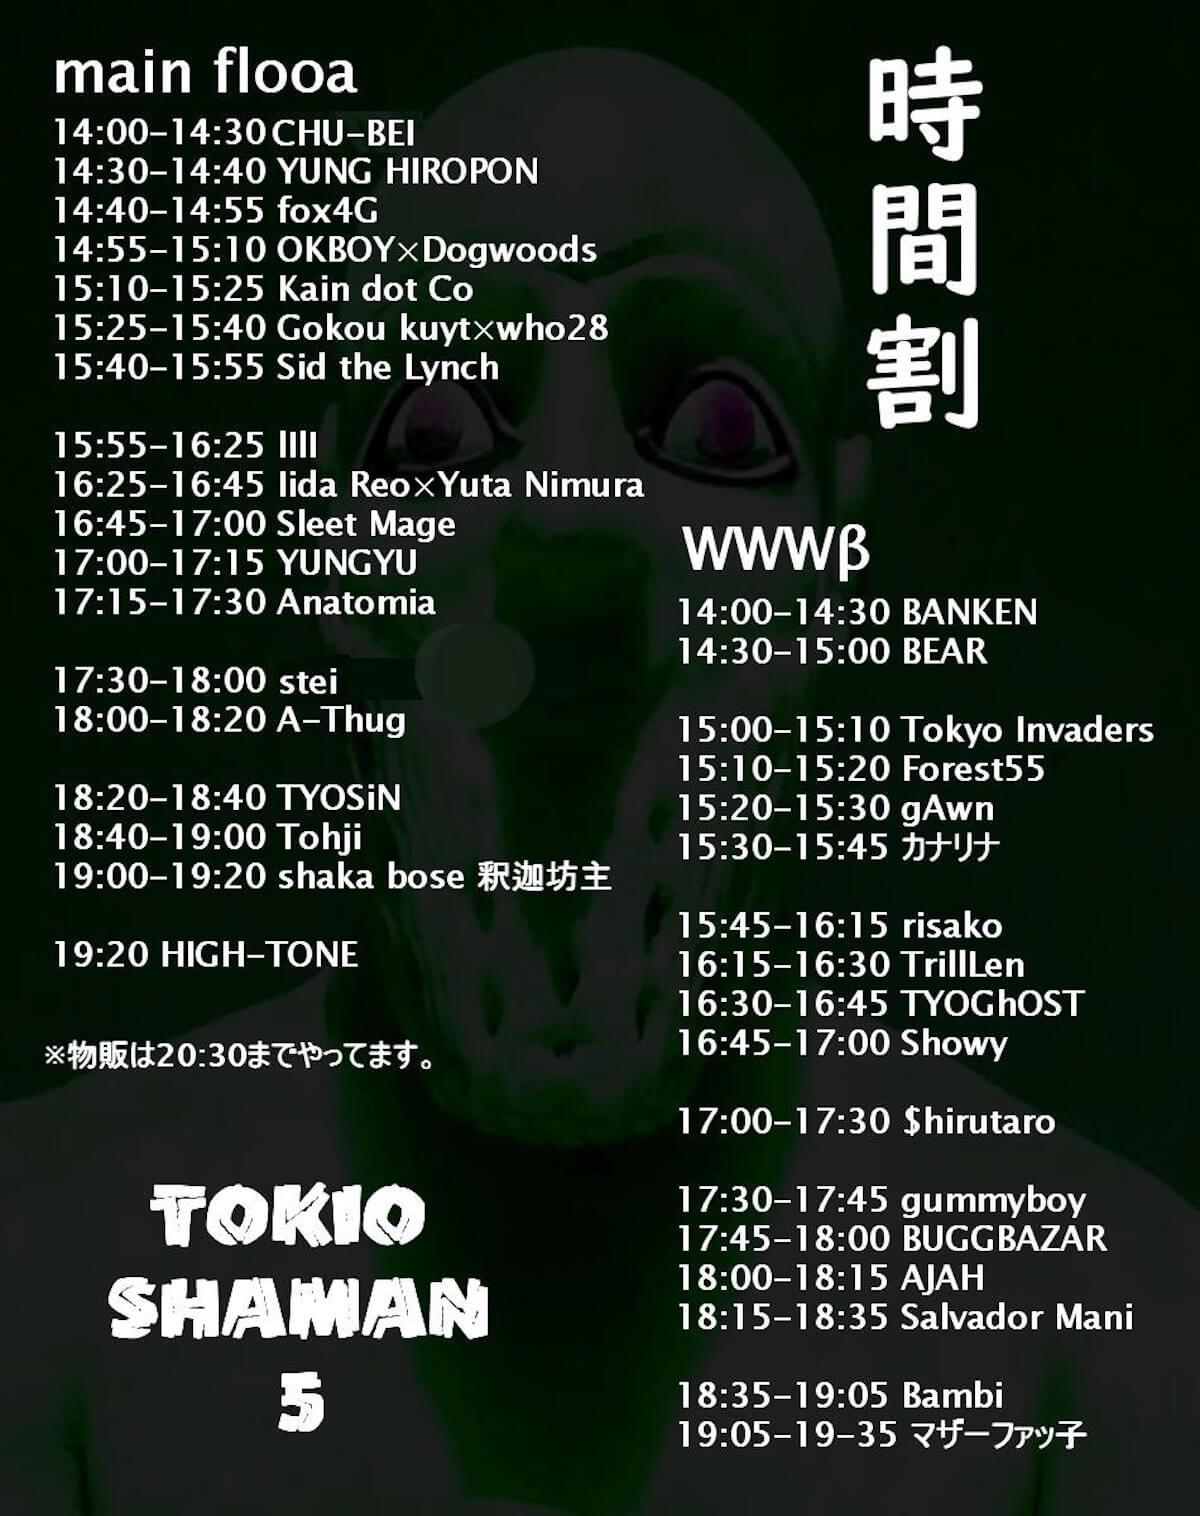 shaka bose 釈迦坊主「TOKIO SHAMAN vol.5」のタイムテーブルが公開&アフターパーティーが本日EBISU BATICAにて急遽開催決定 music190505-tokio-shaman-2